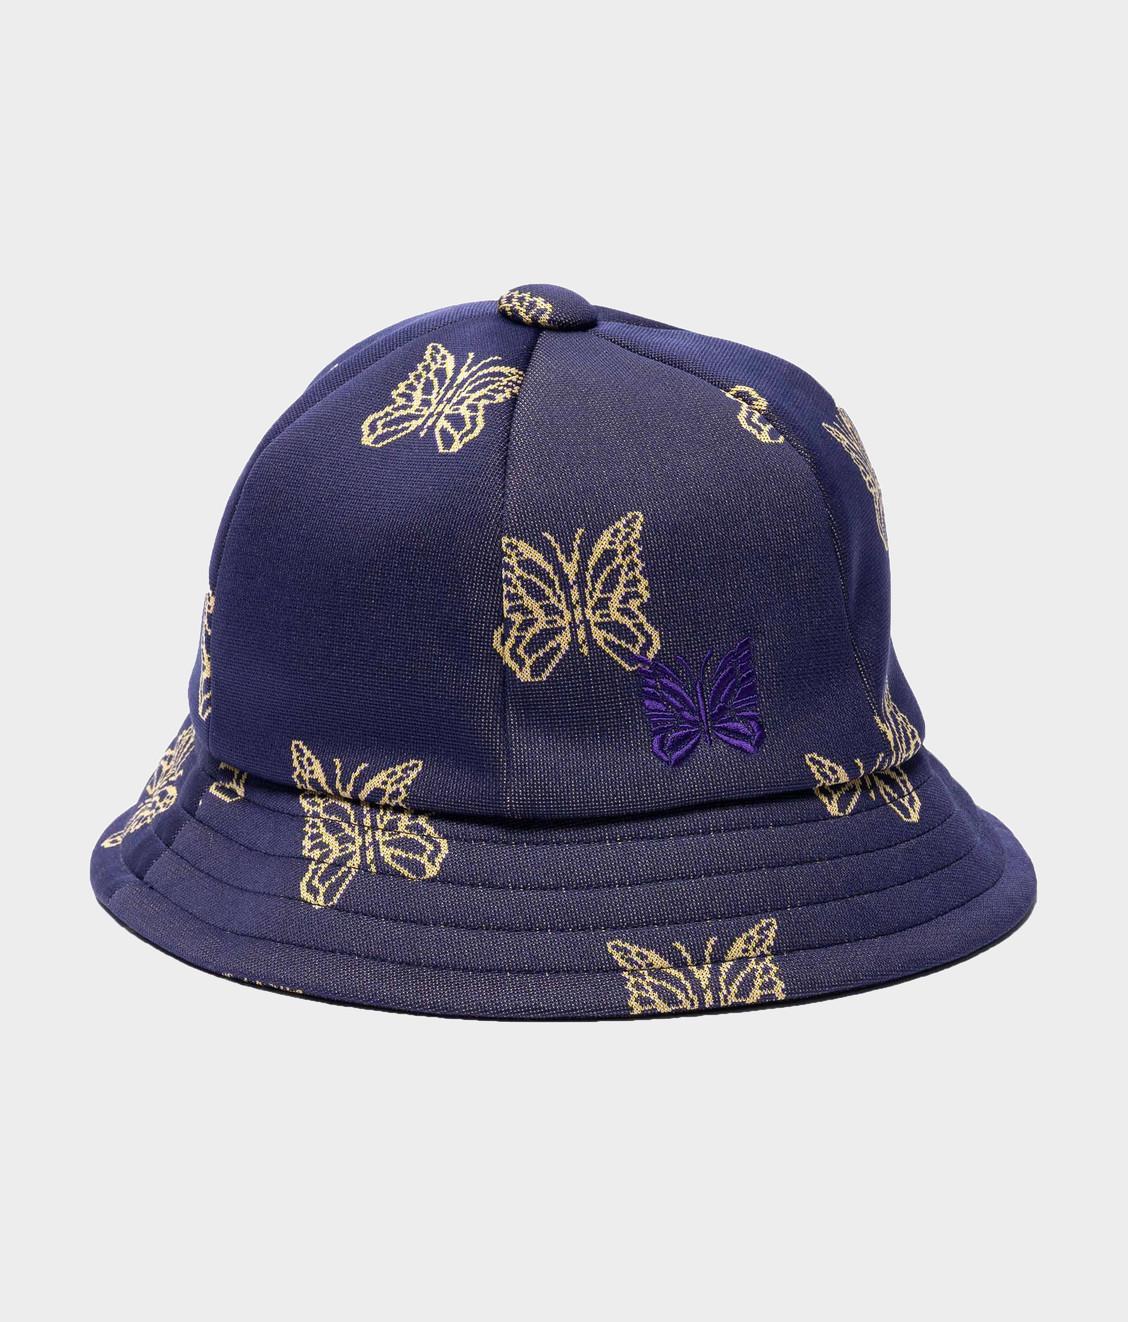 Needles Needles Bermuda Hat Poly Jacquard Papillon